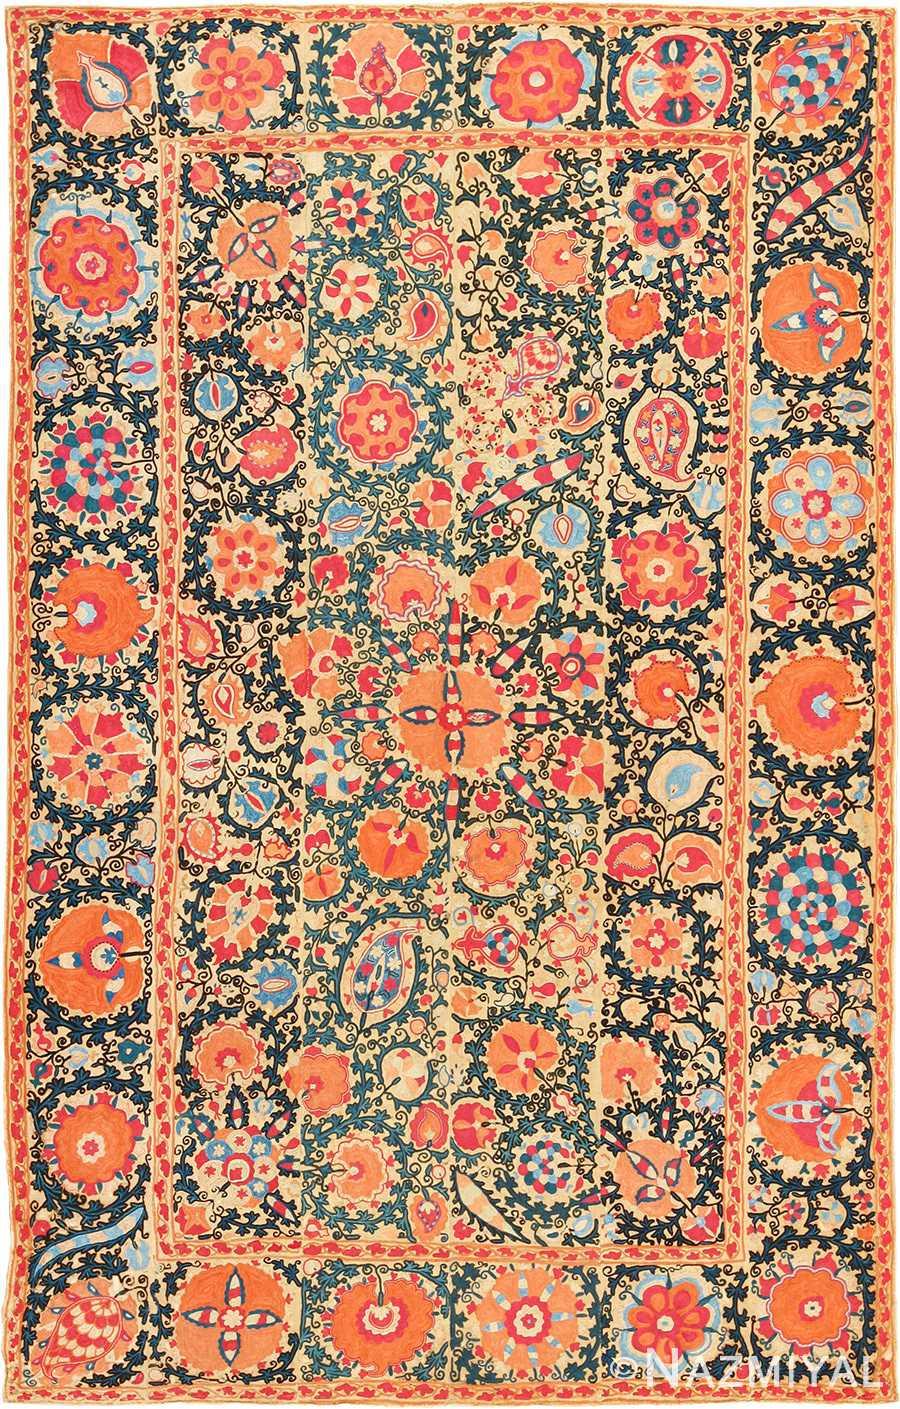 antique floral suzani uzbek textile 49460 Nazmiyal